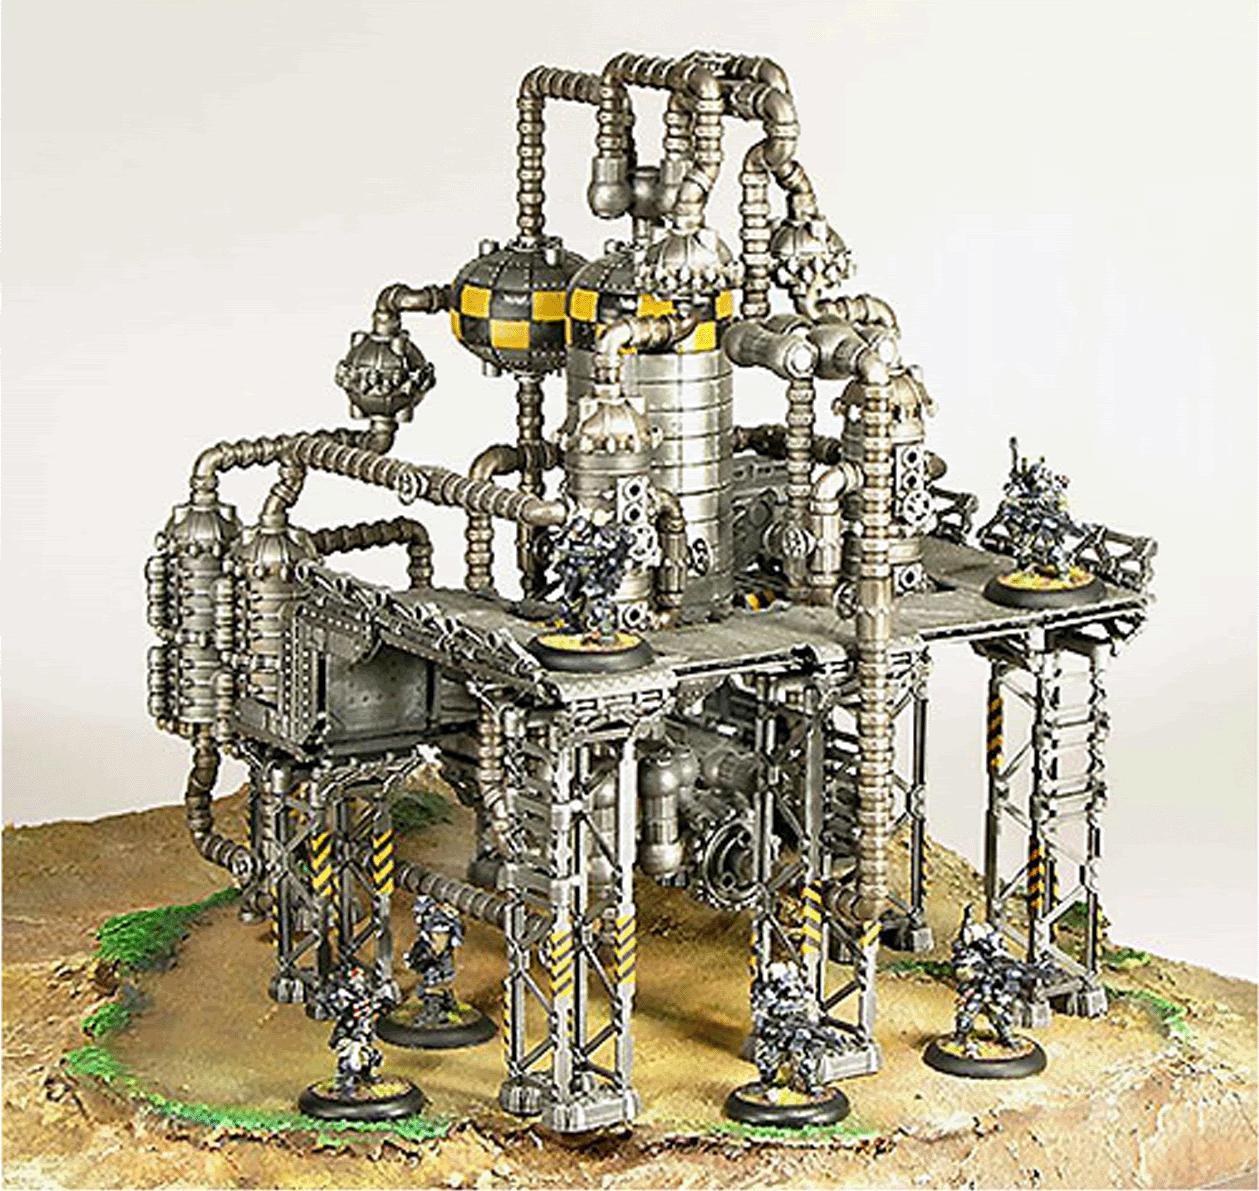 Biotoxin Plant, Industrial, Review, Terrain, Urban Mammoth, Urban War